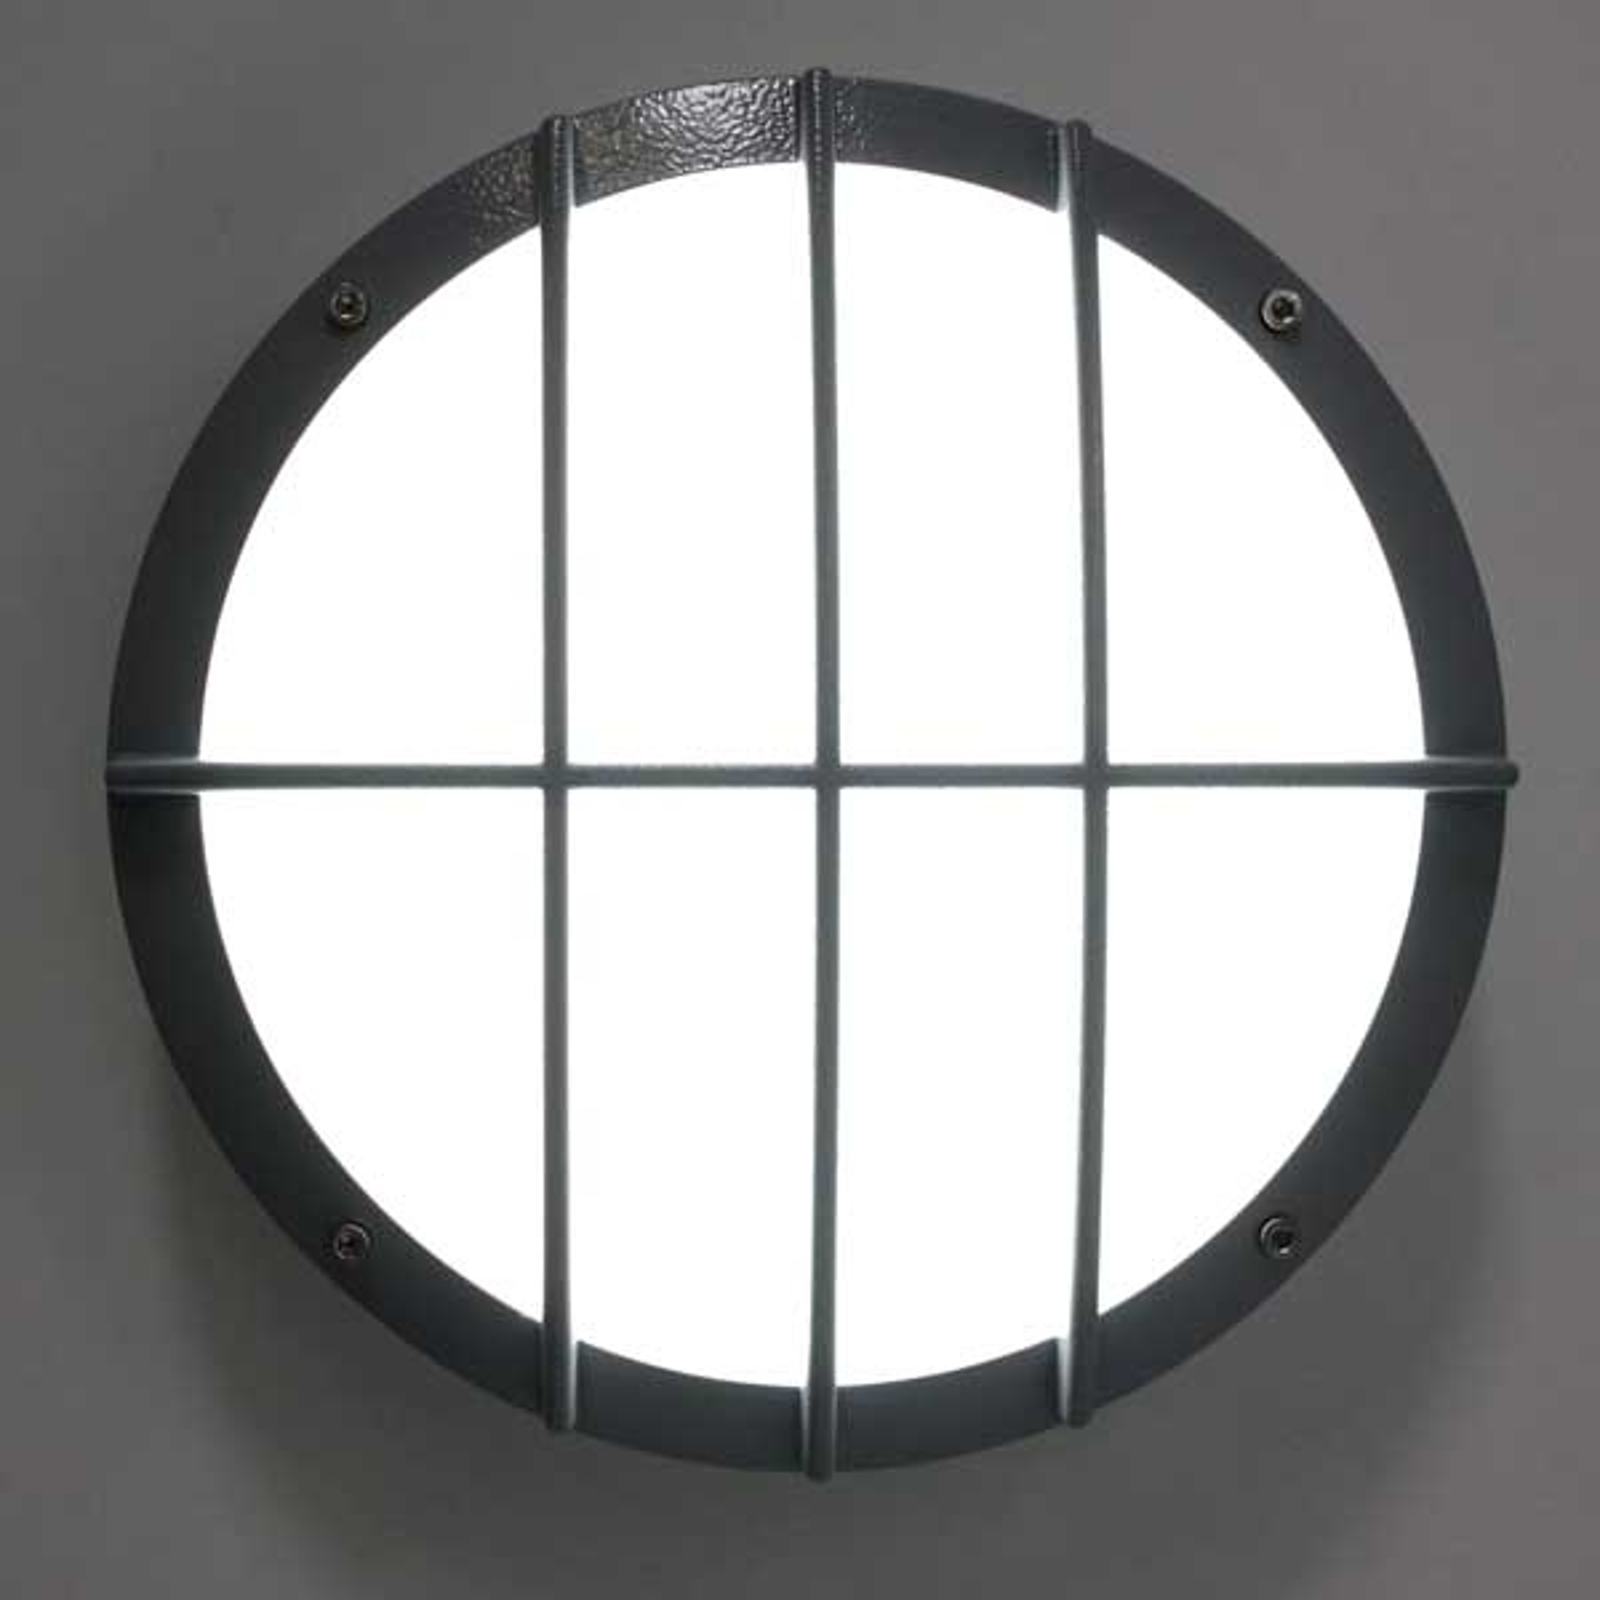 Spuitgietalu wandlamp SUN 8 LED 13 W 3 K